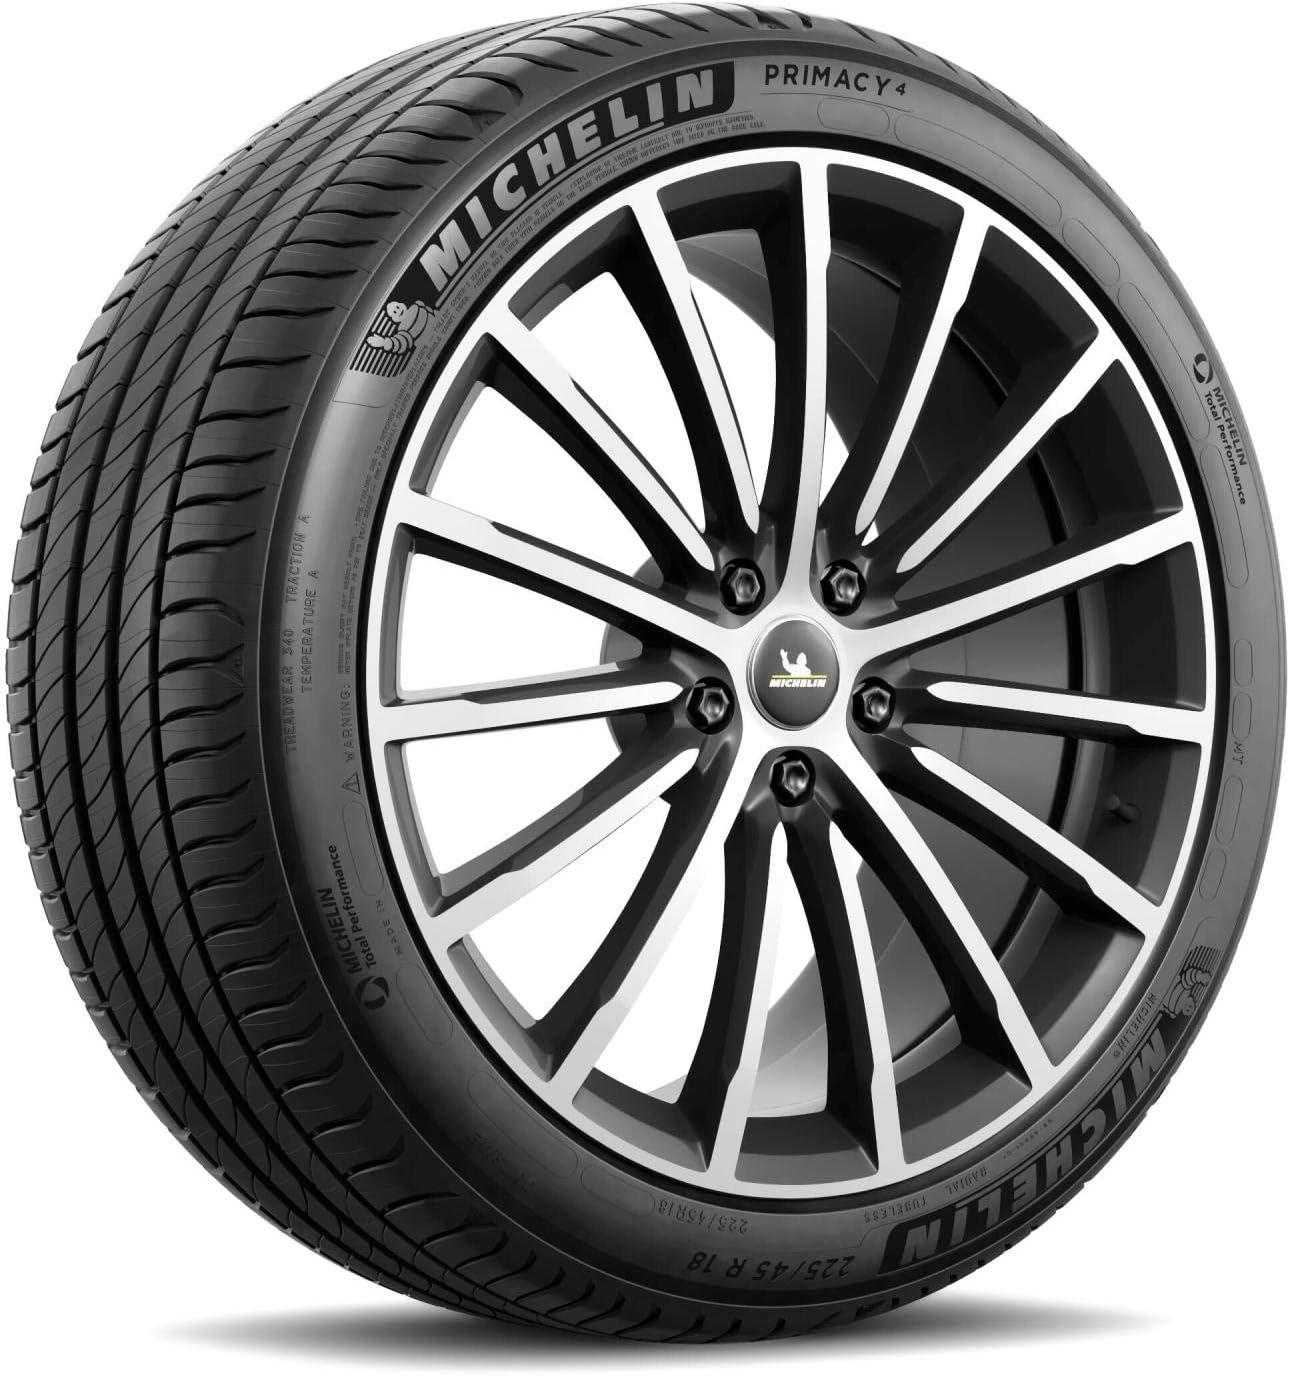 Reifen Sommer Michelin Primacy 4 225 45 R18 95w Xl Standard Auto